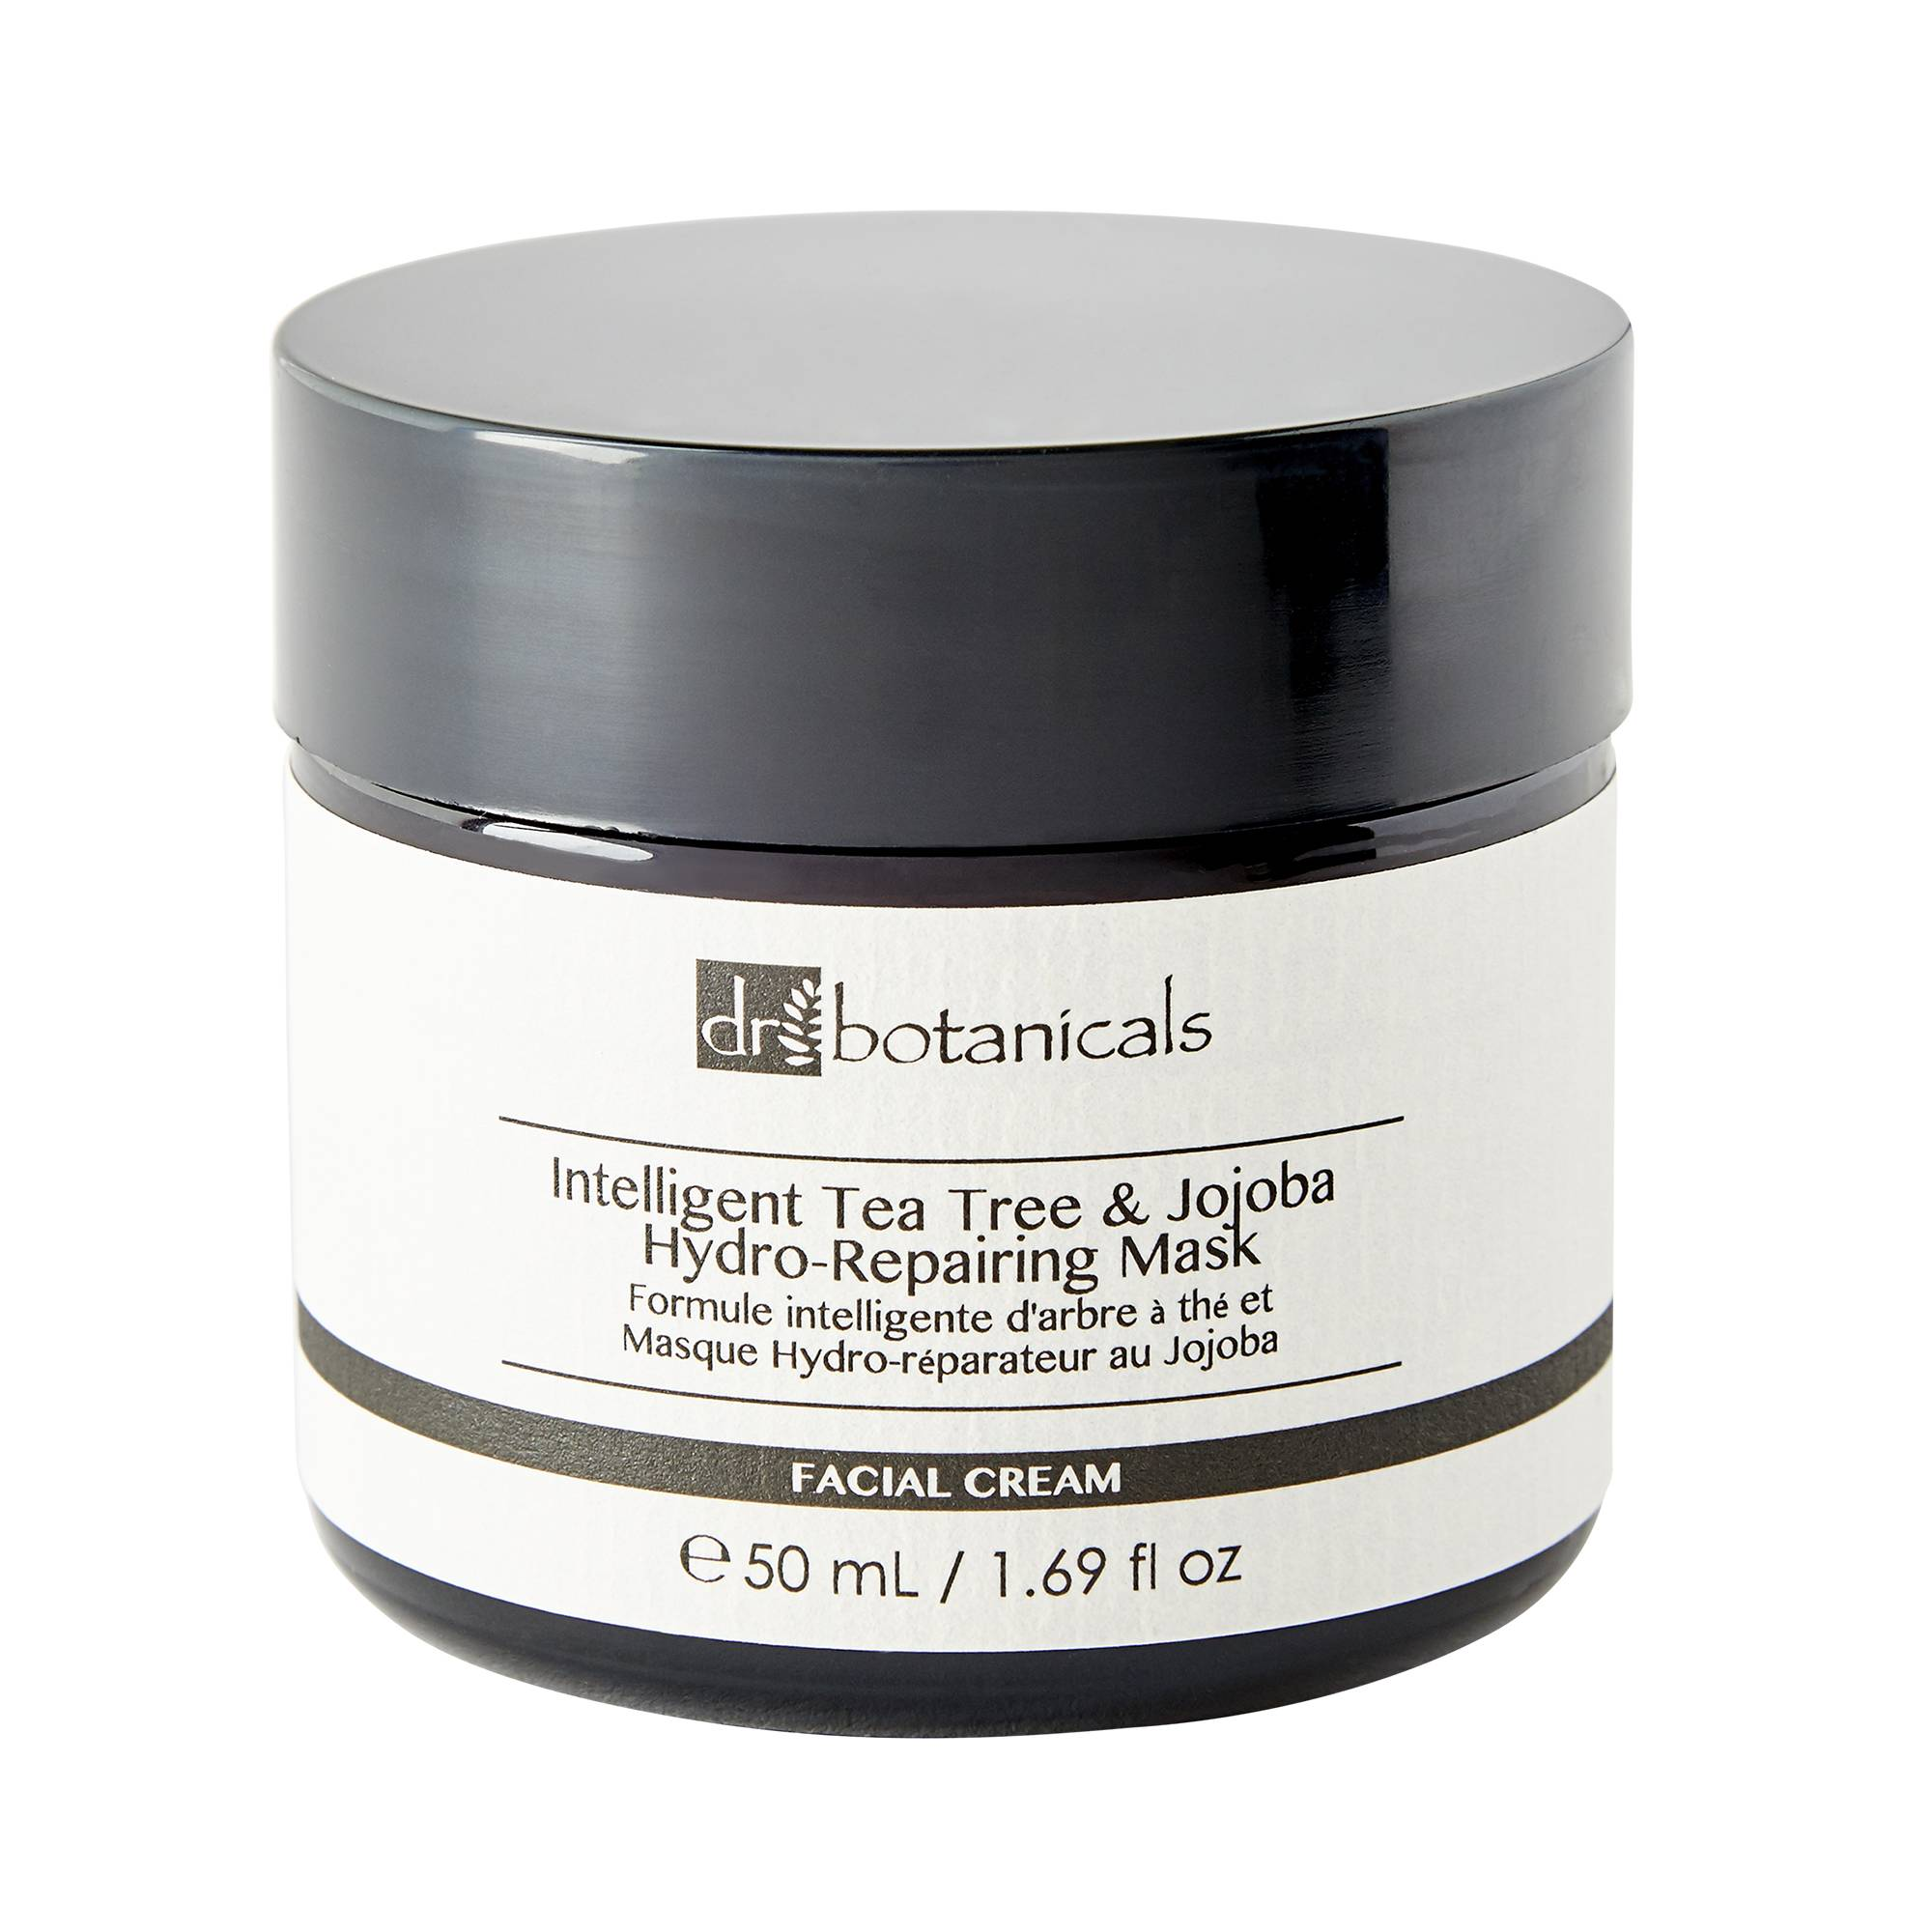 Dr. Botanicals Intelligent Tea tree and Jojoba HydroRepairing Mask 50ml